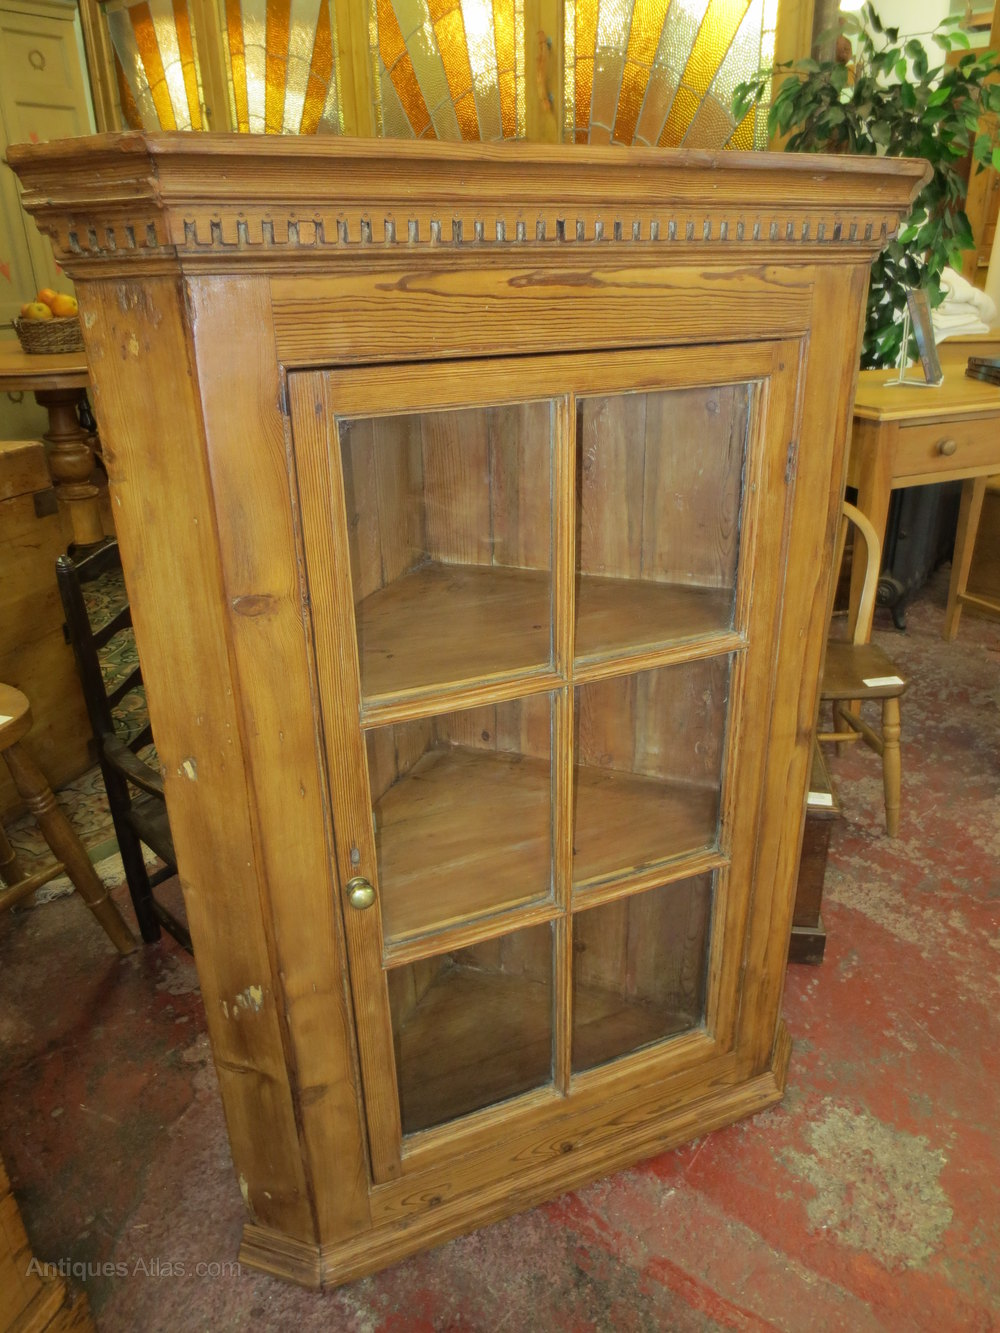 Victorian Pine Corner Cupboard - Victorian Pine Corner Cupboard - Antiques Atlas